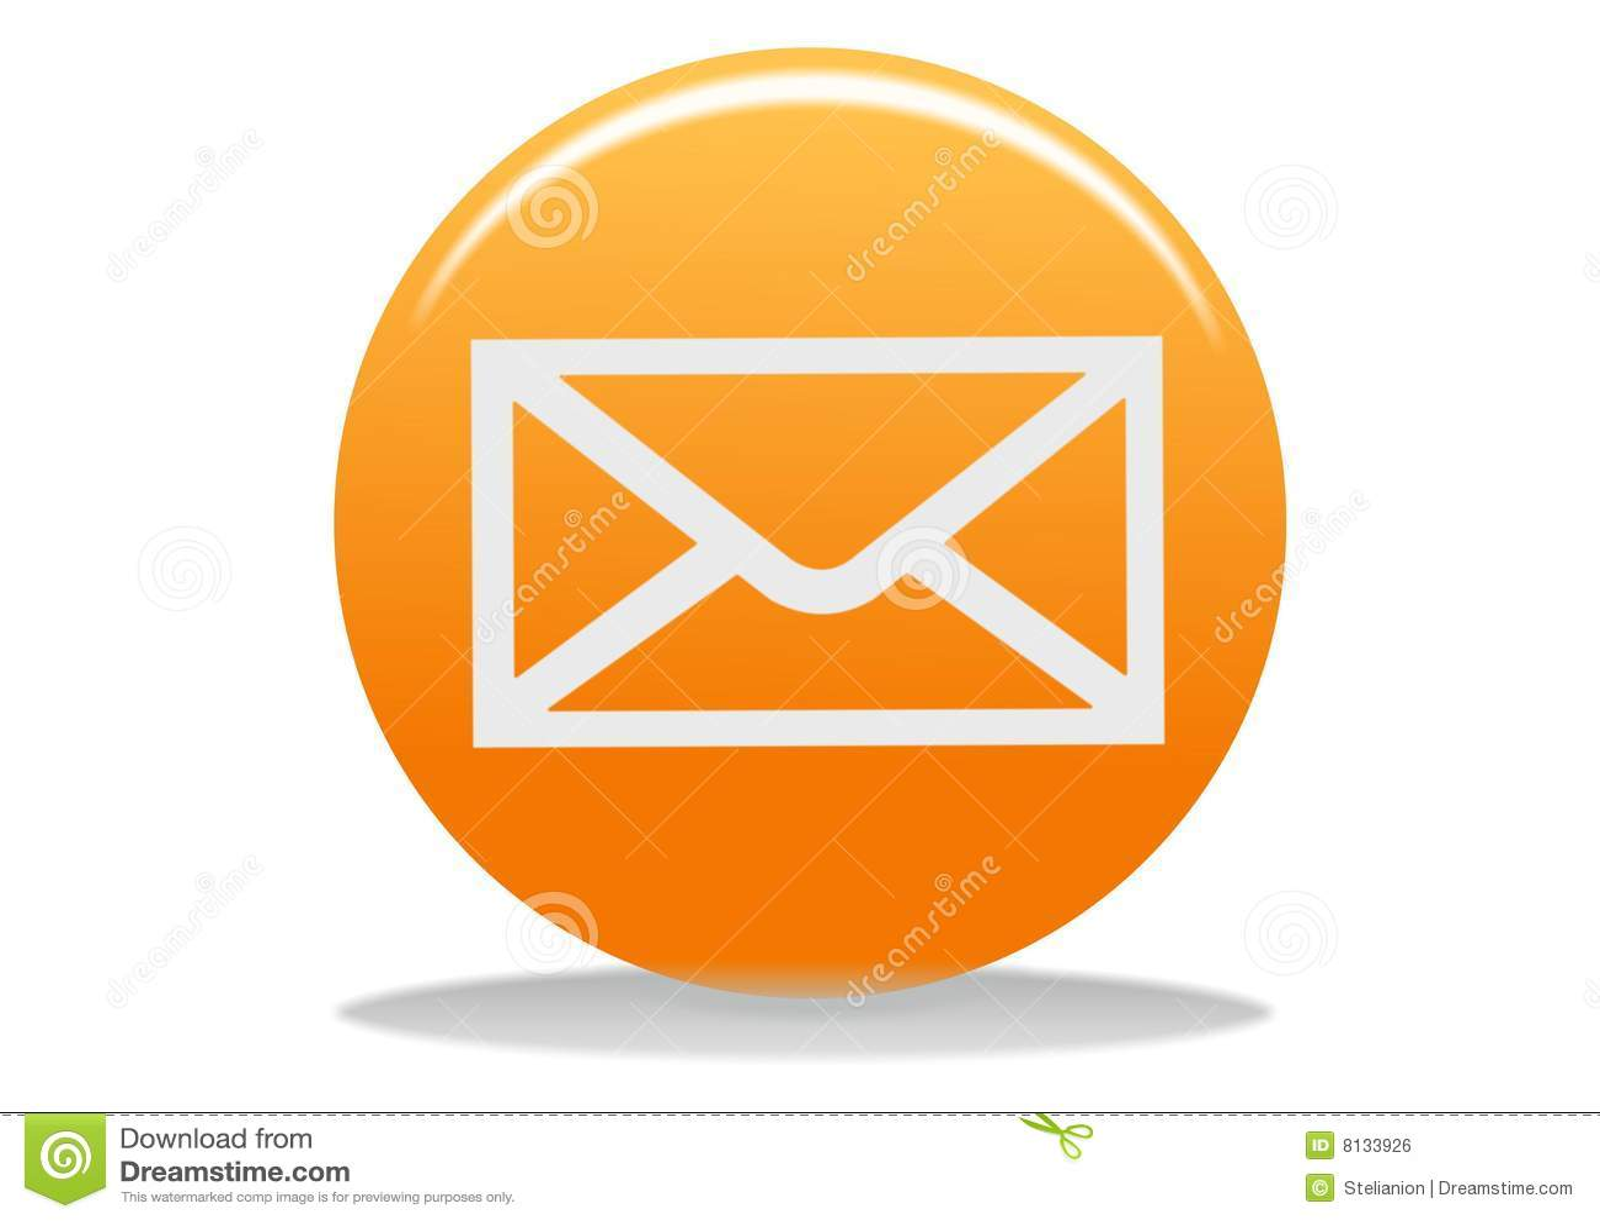 Email Icon Royalty Free Stock Image - Image: 8133926  Email Icon Roya...